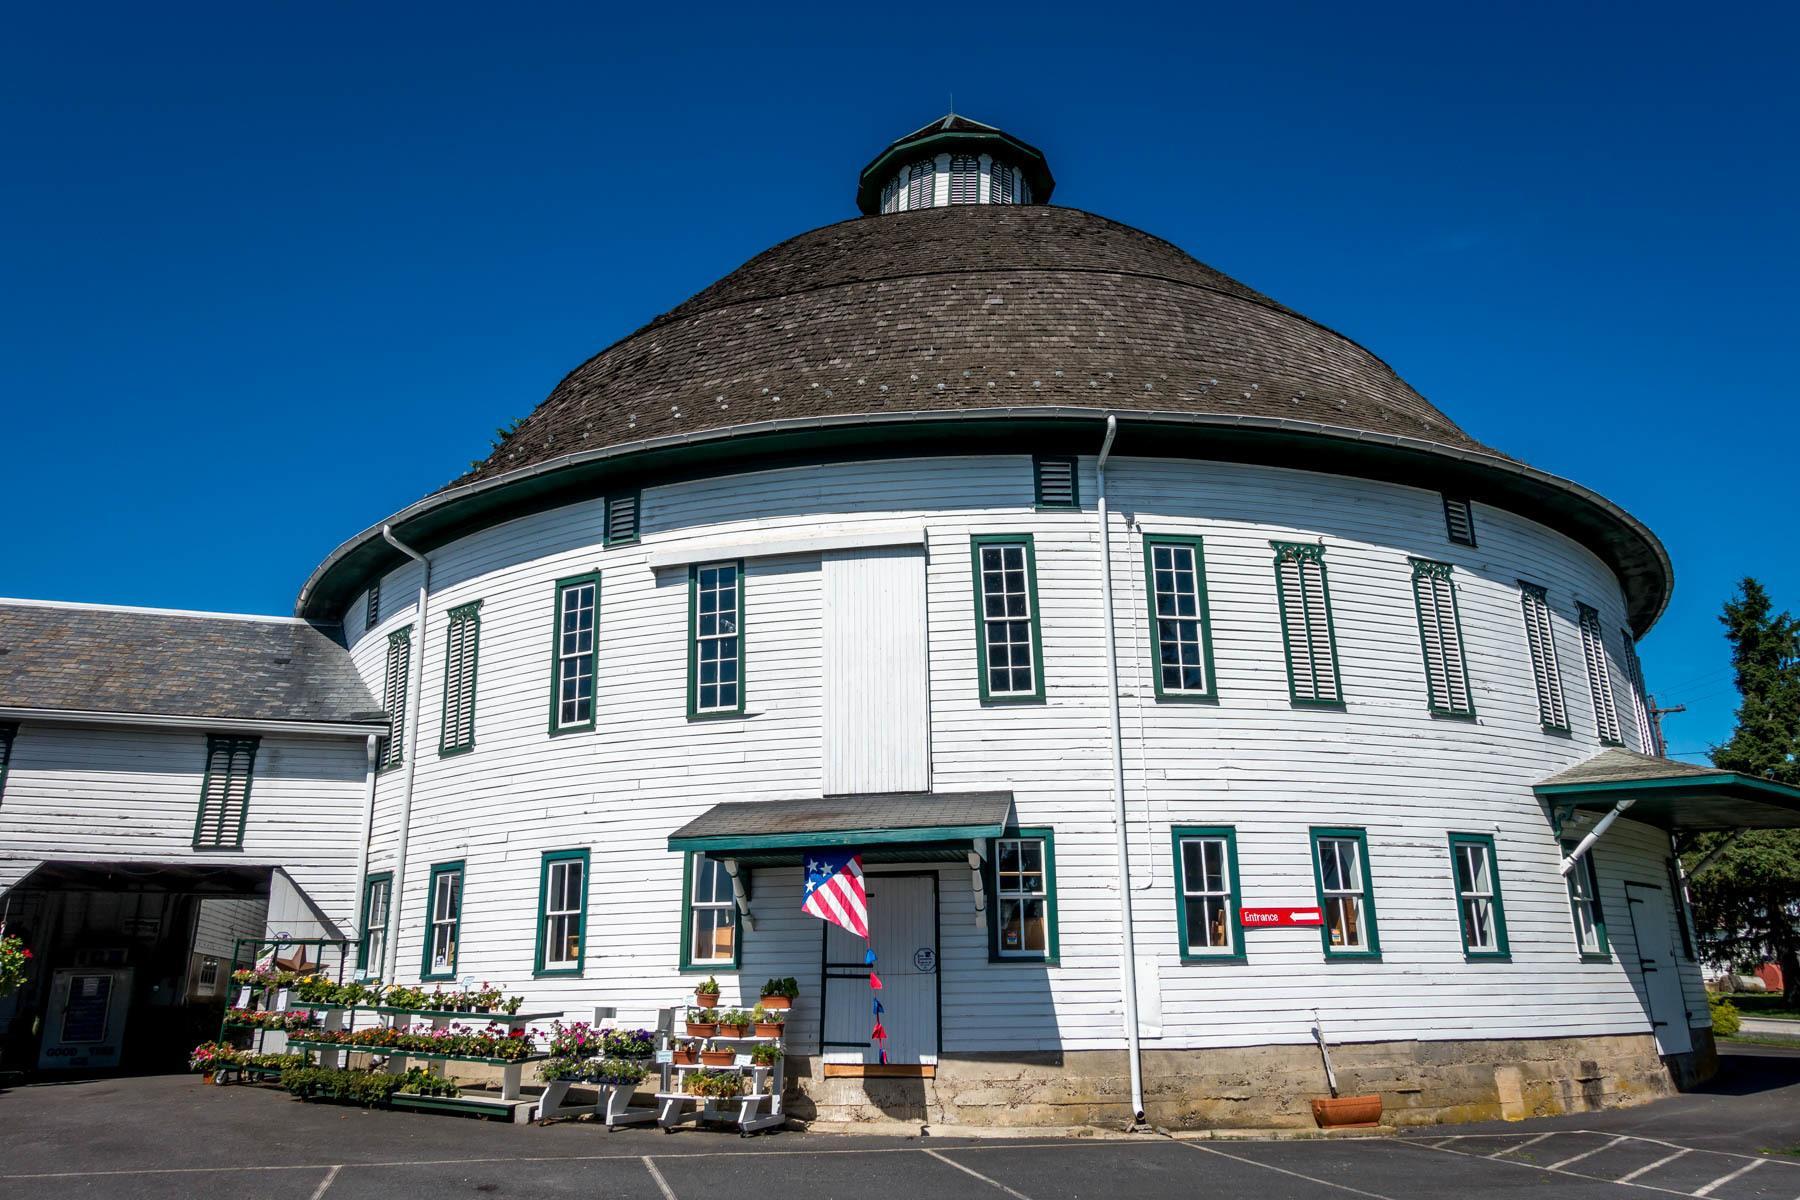 White Round Barn in Gettysburg PA